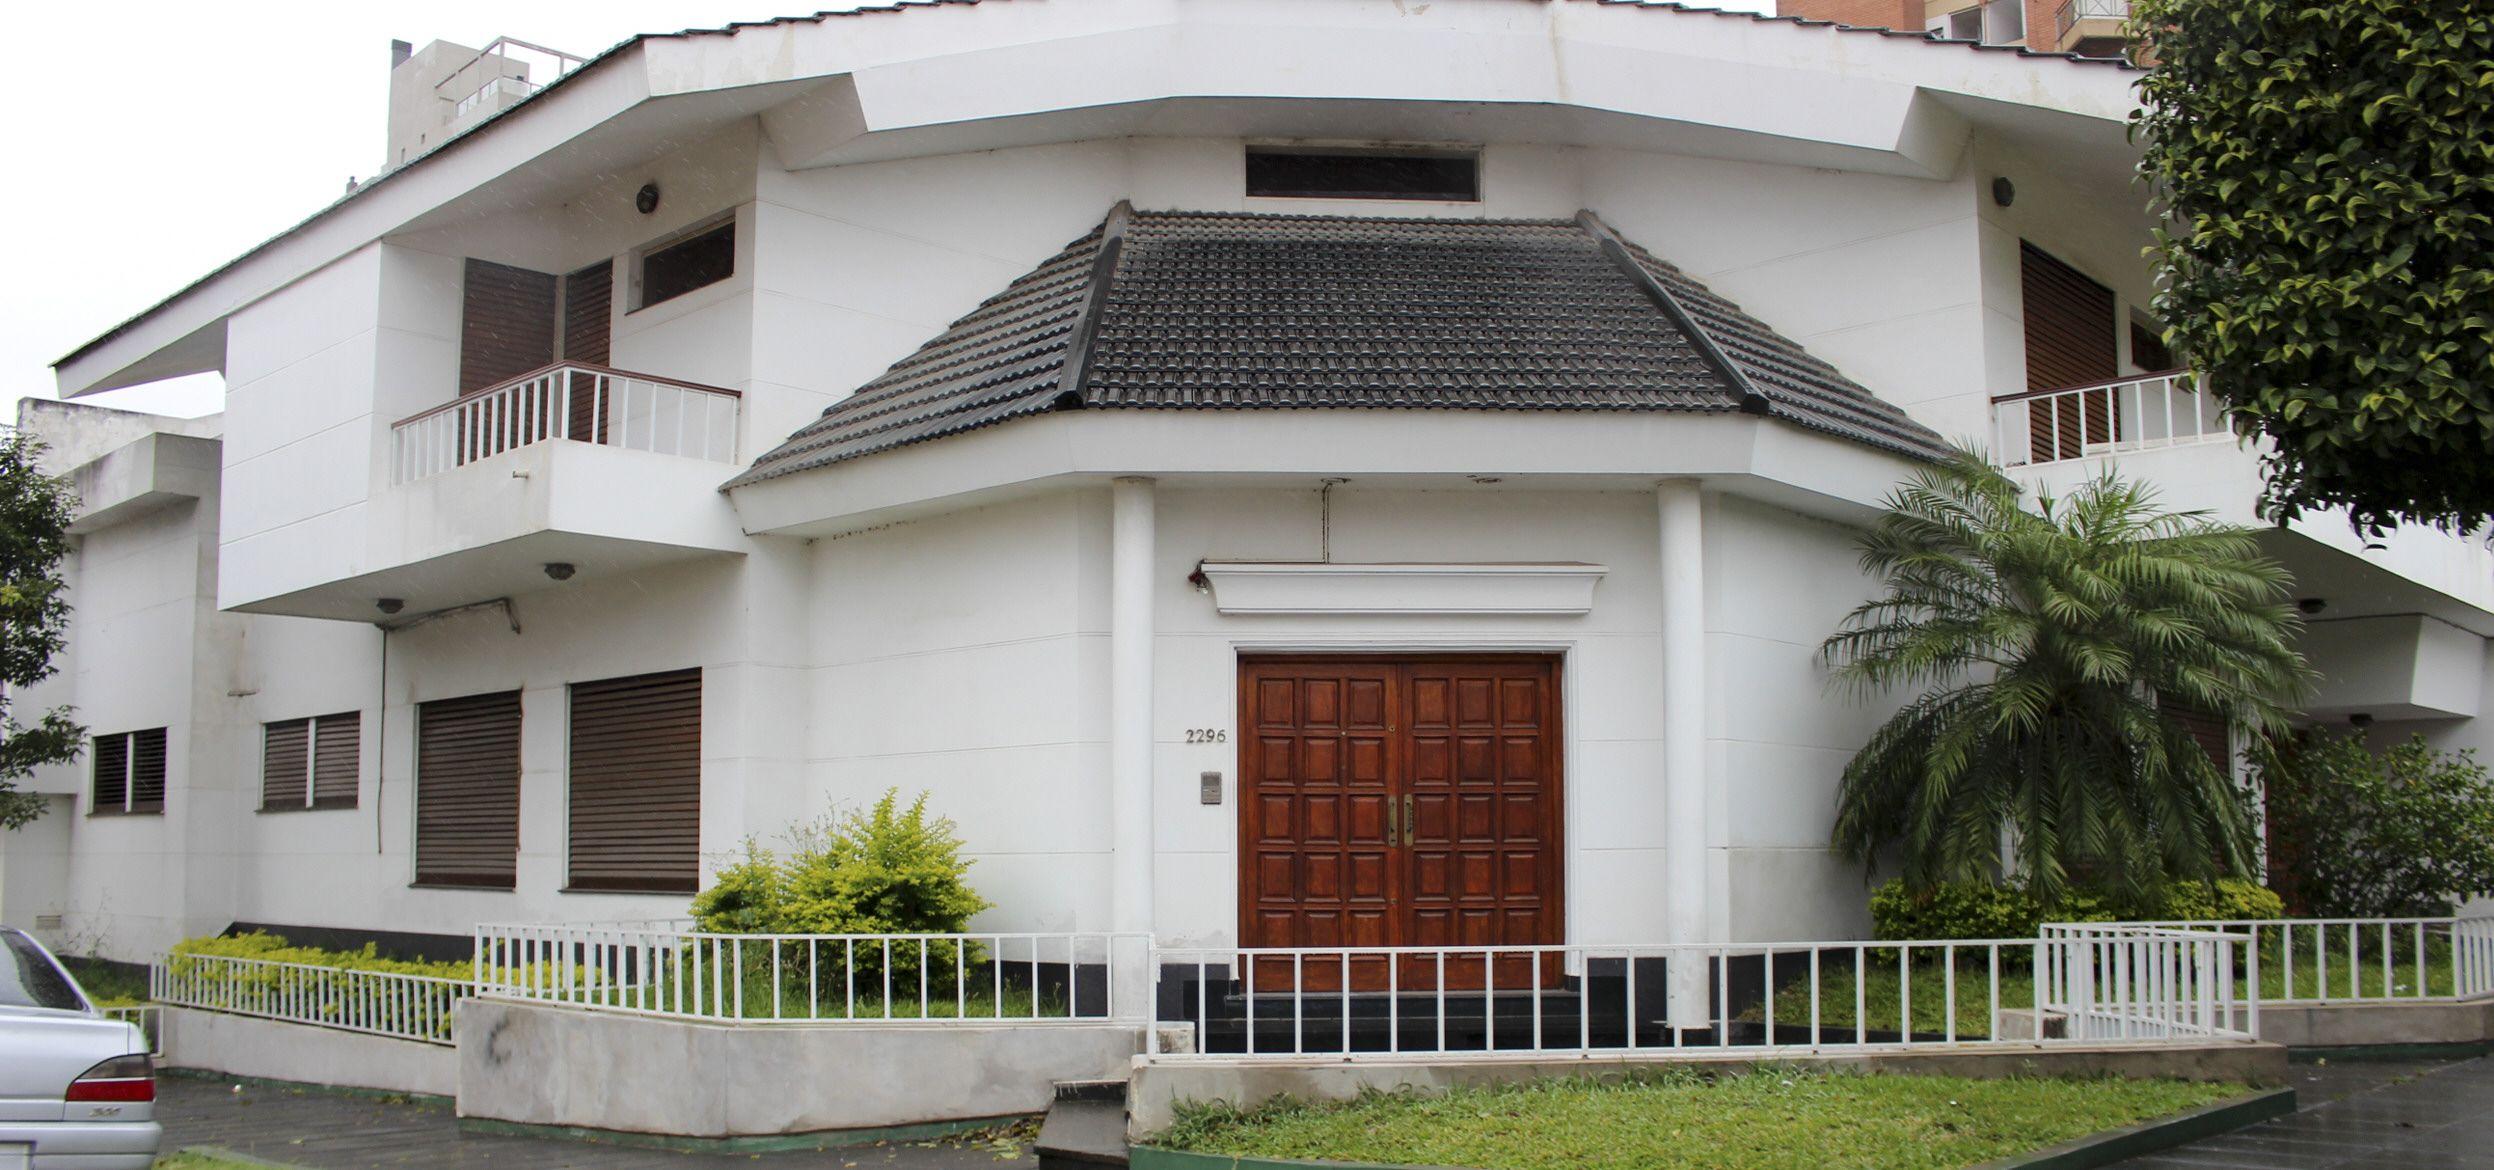 casa de colombi